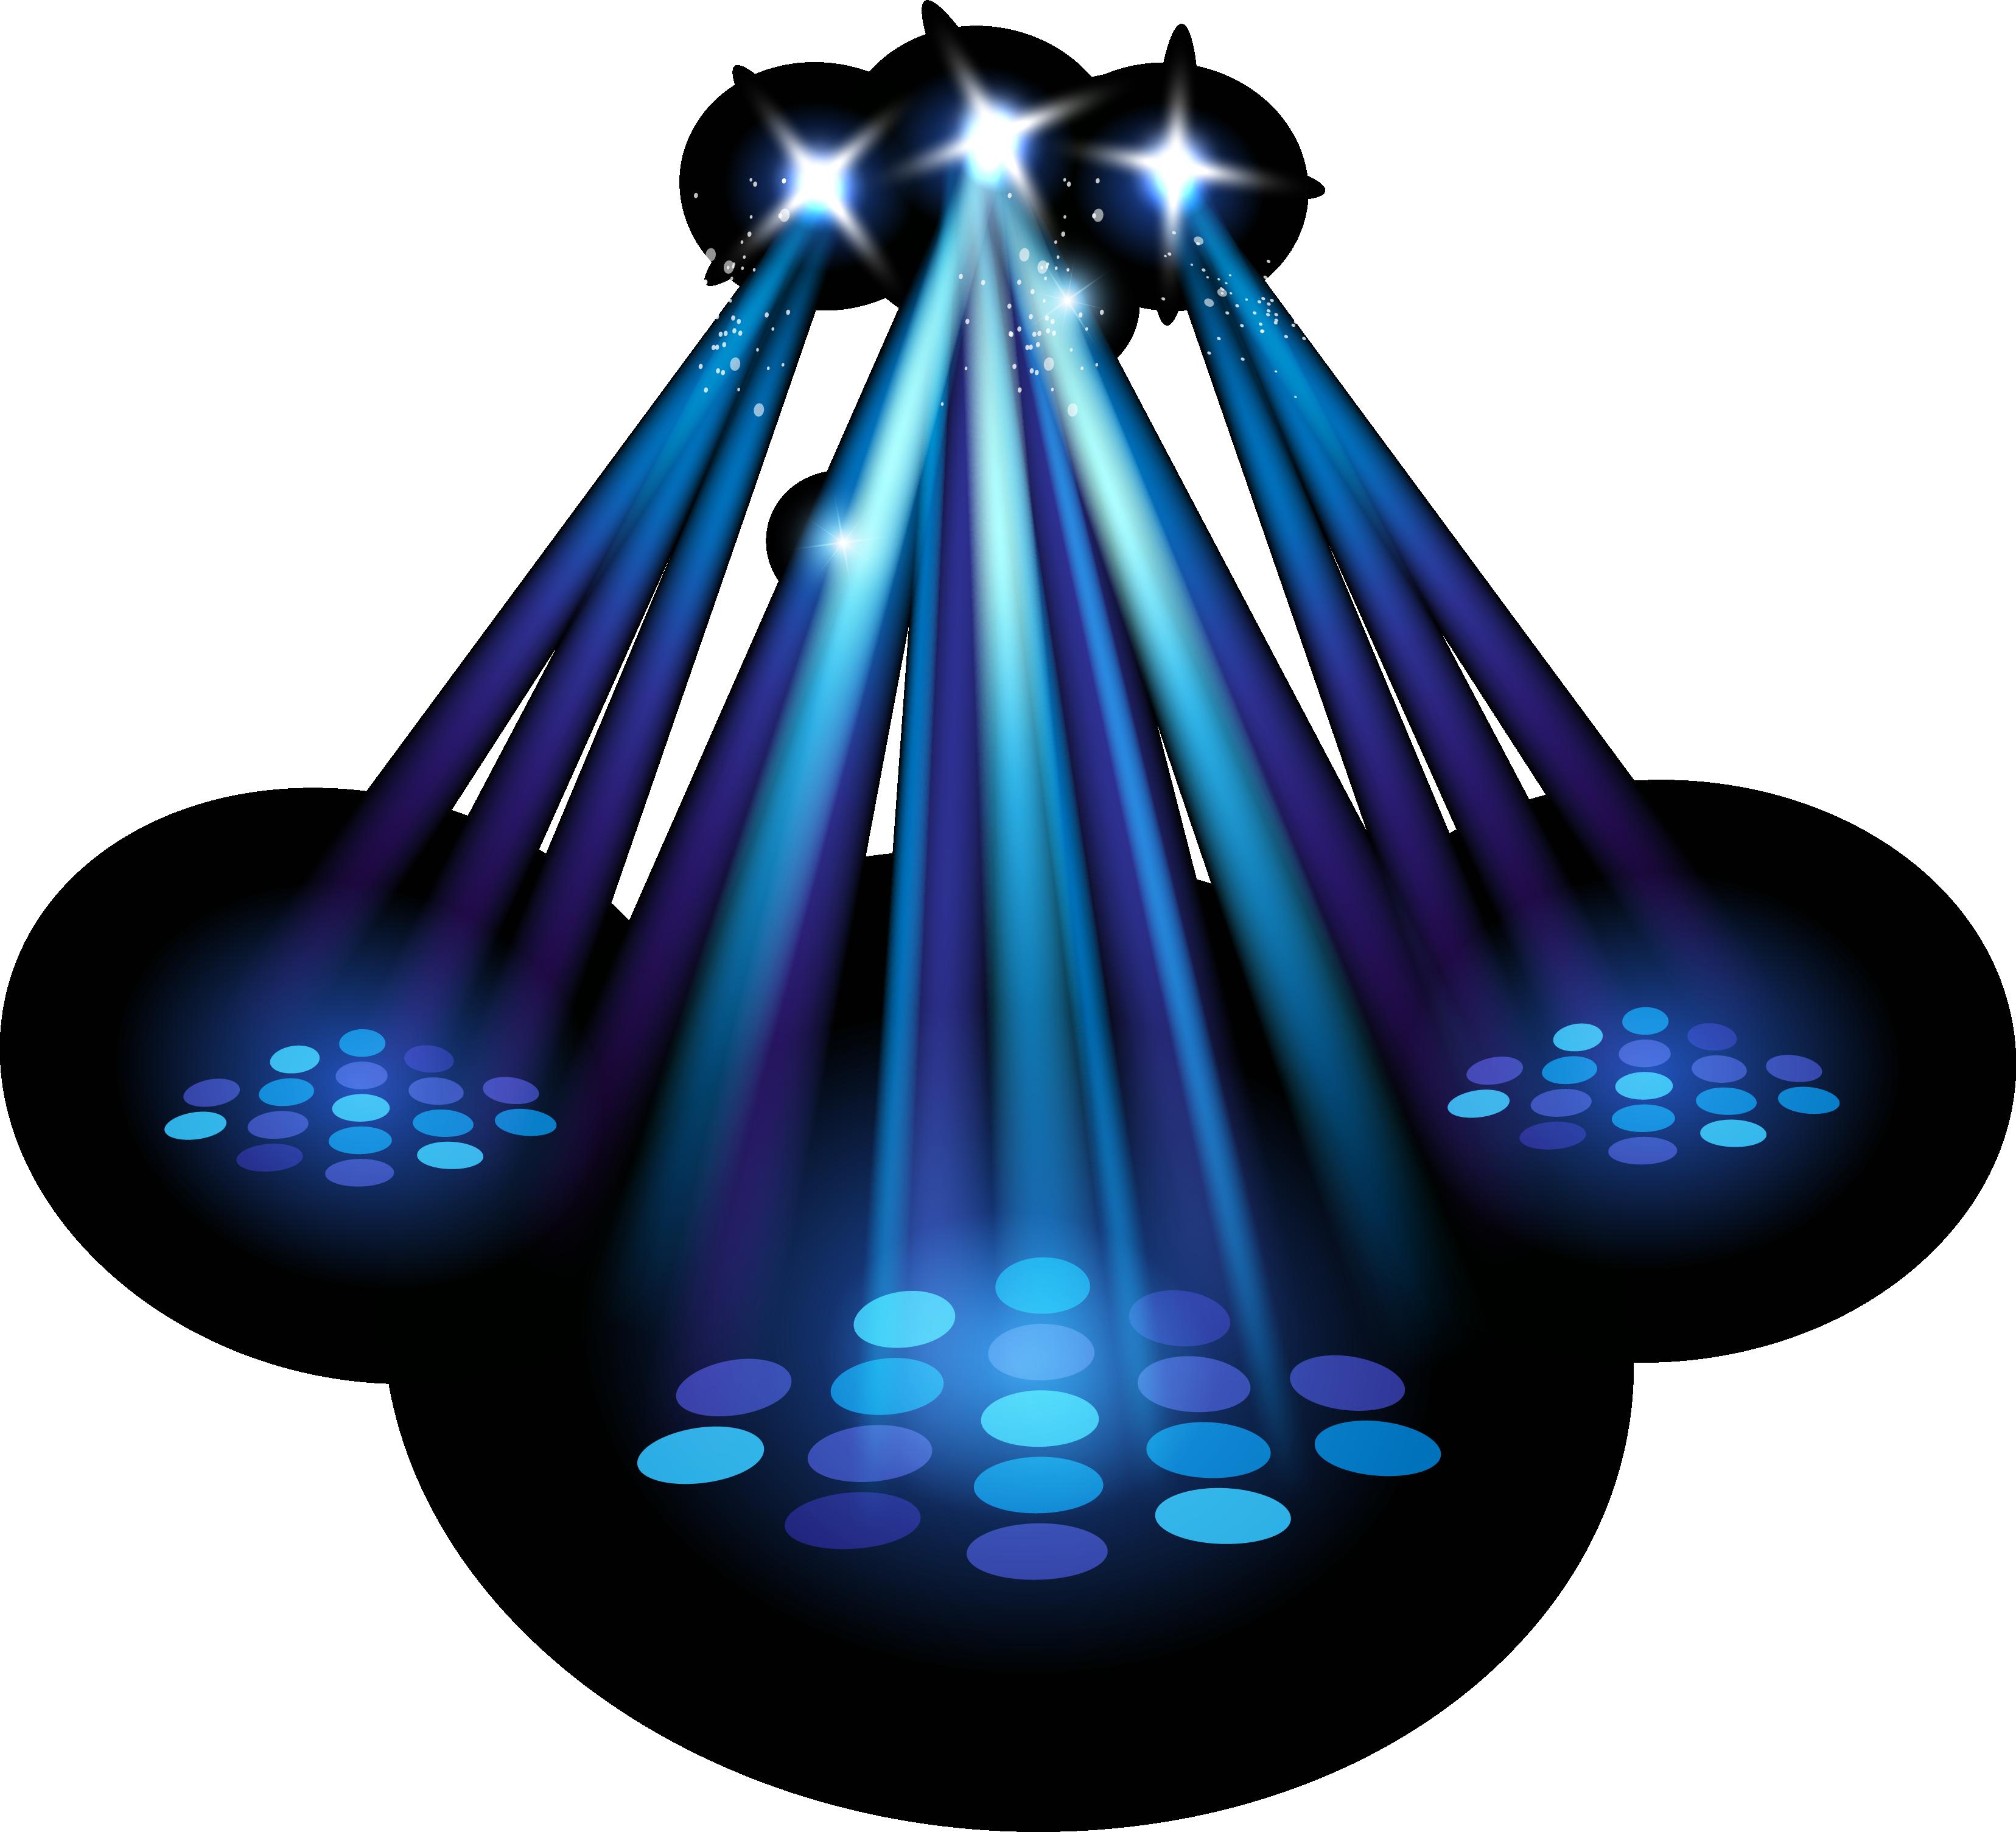 Curtain clipart stage spotlight, Curtain stage spotlight ...